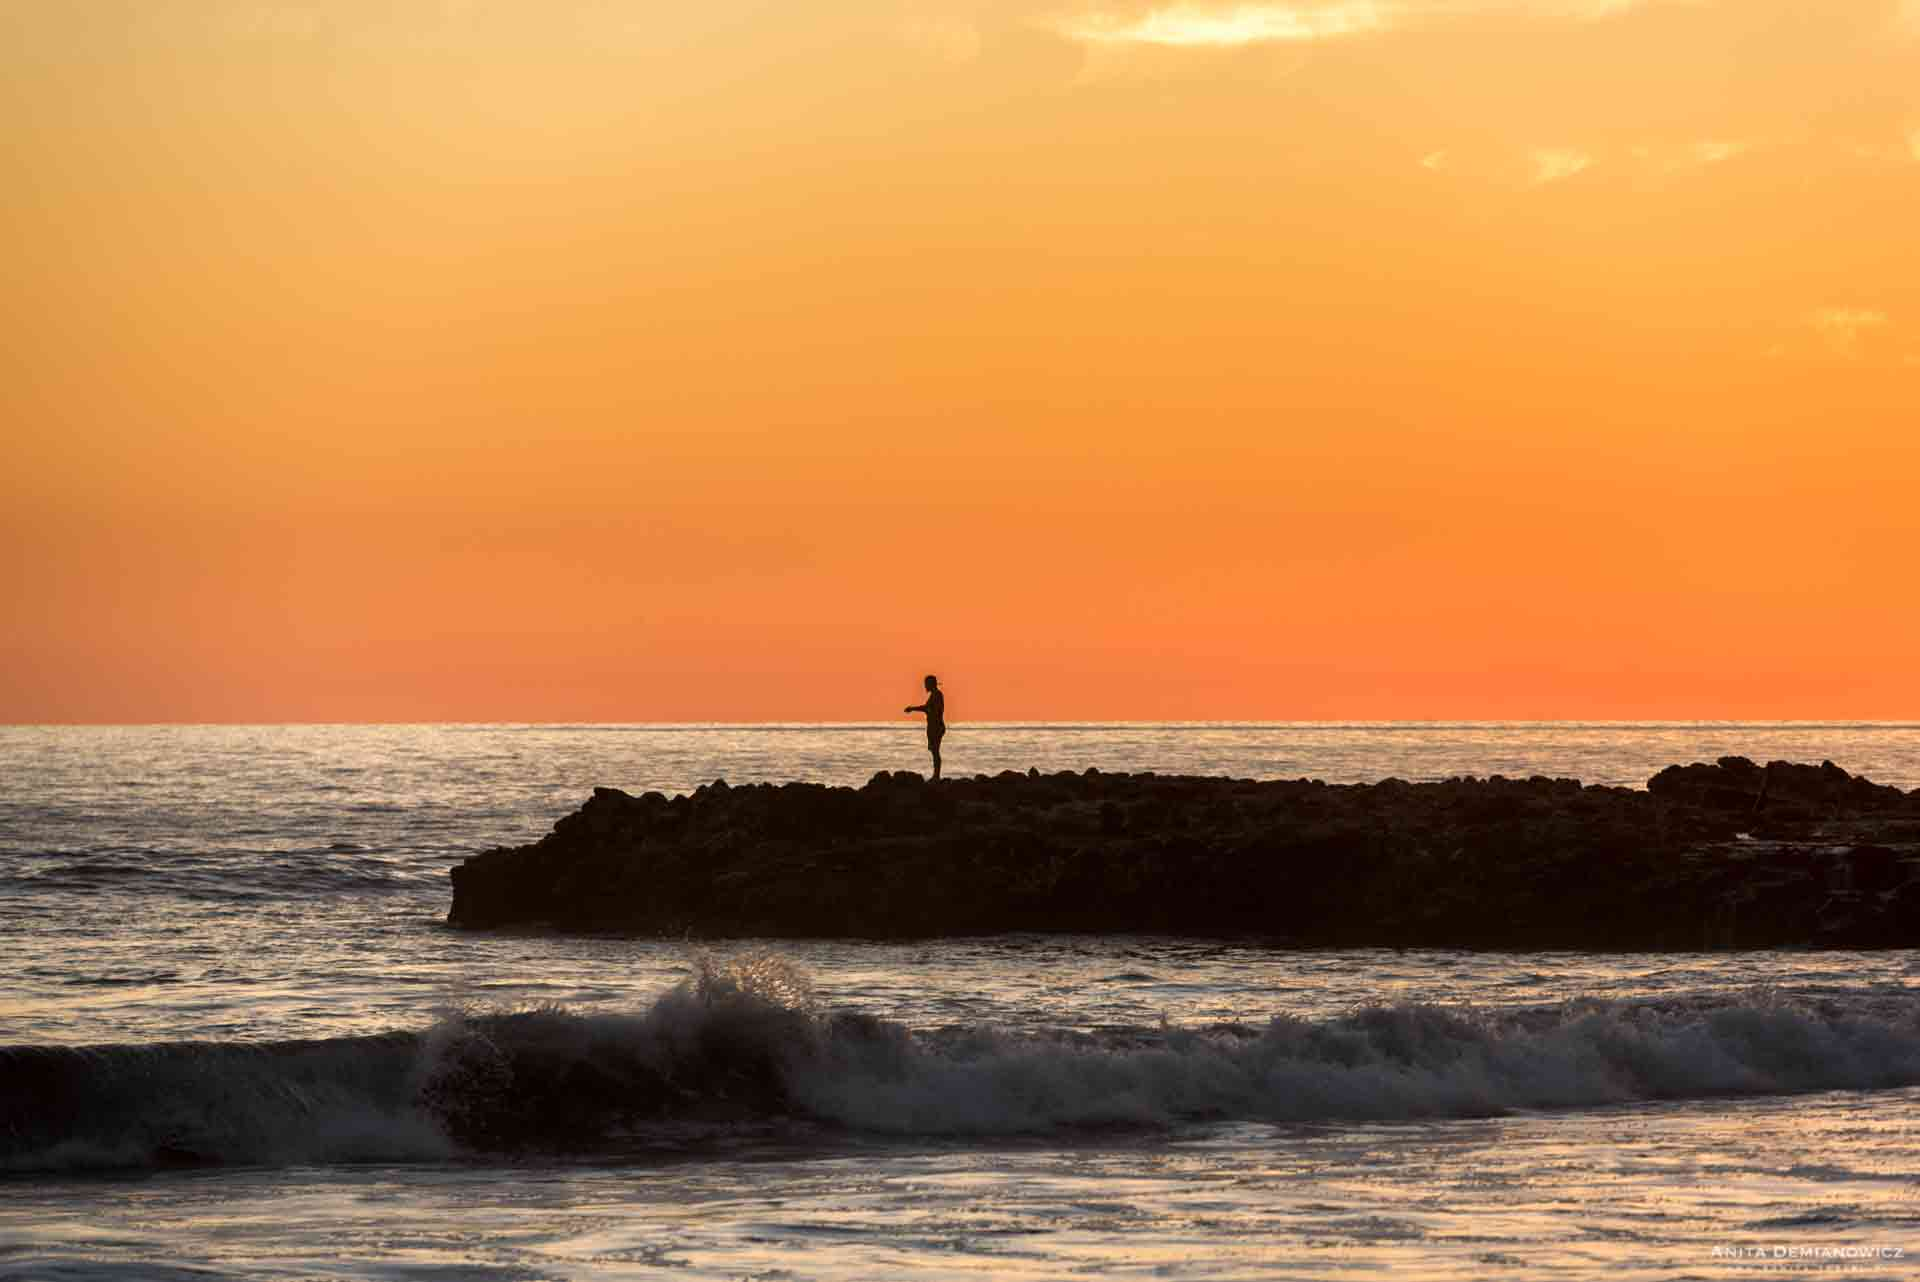 I Traveled Around The World To Take Photos Of The Most Beautiful Sunsets And Sunrises